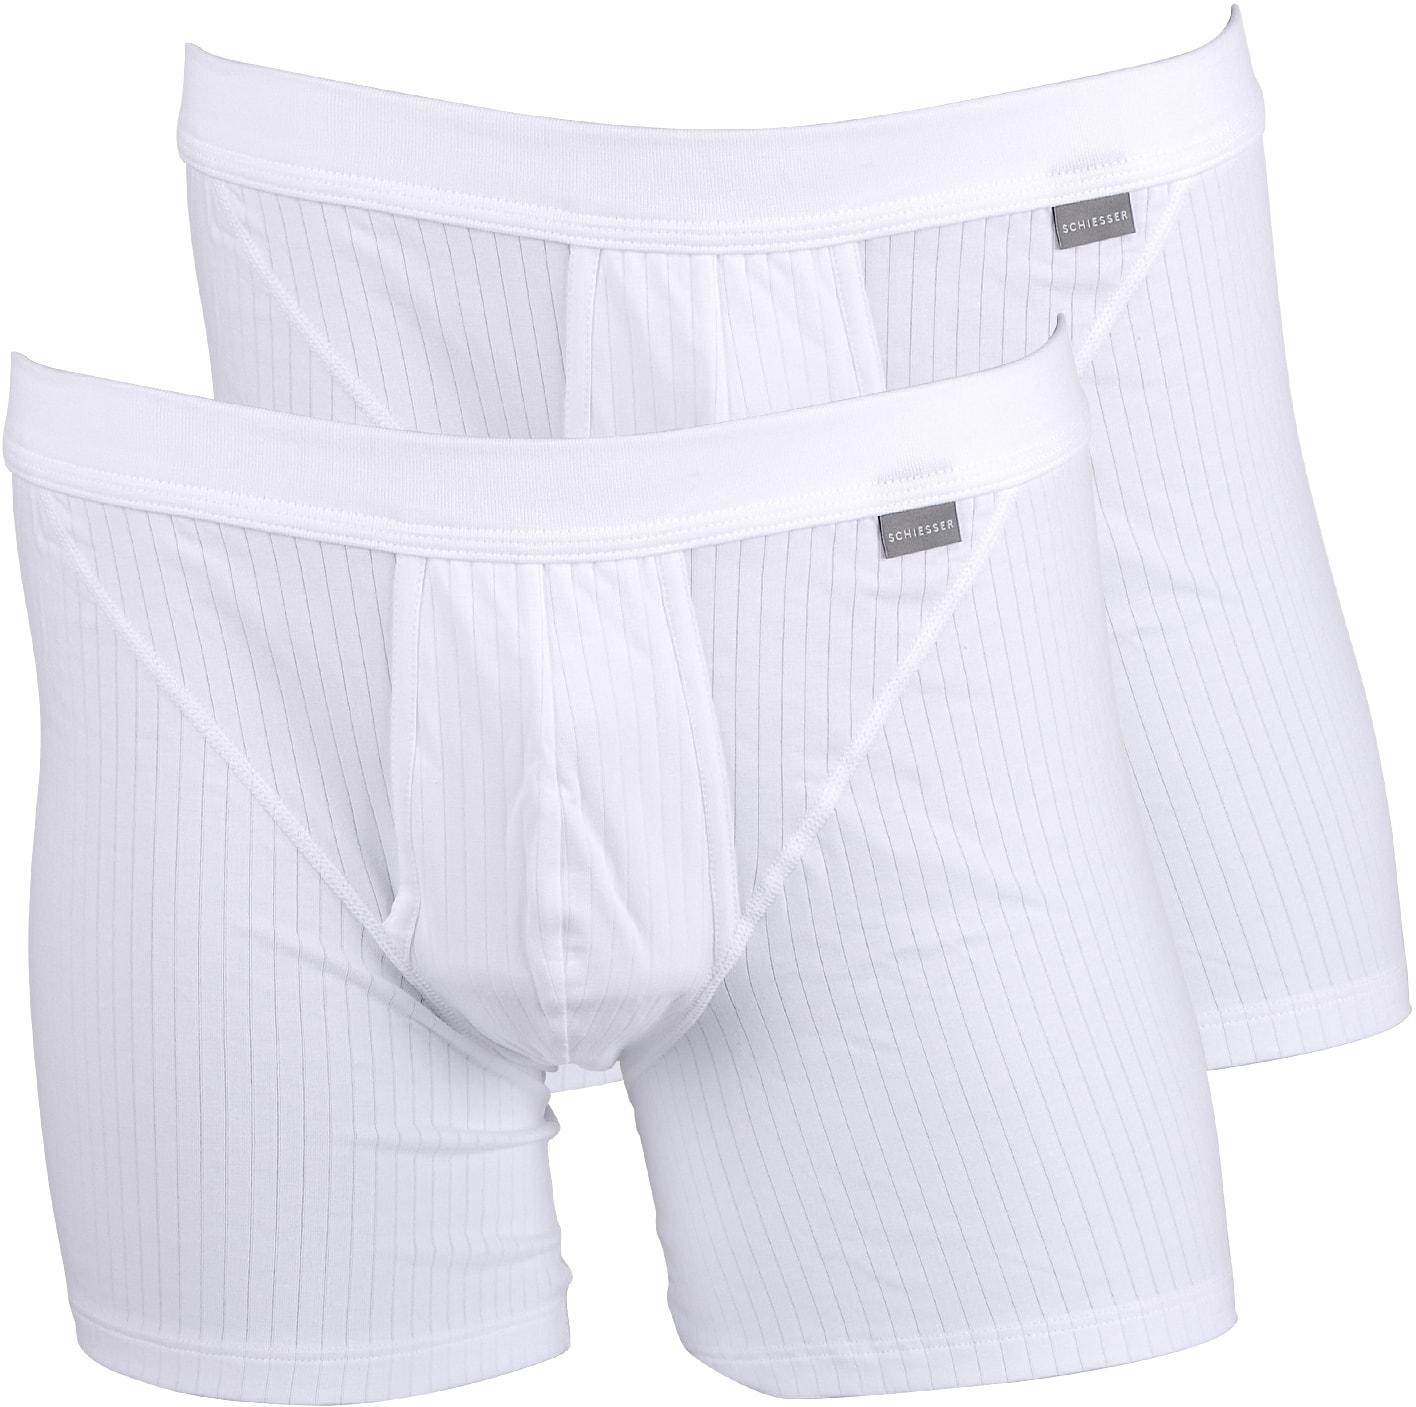 fd2e4e13672 Schiesser Boxer Shorts White Authentic 2-Pack 103399-100 Short 2P